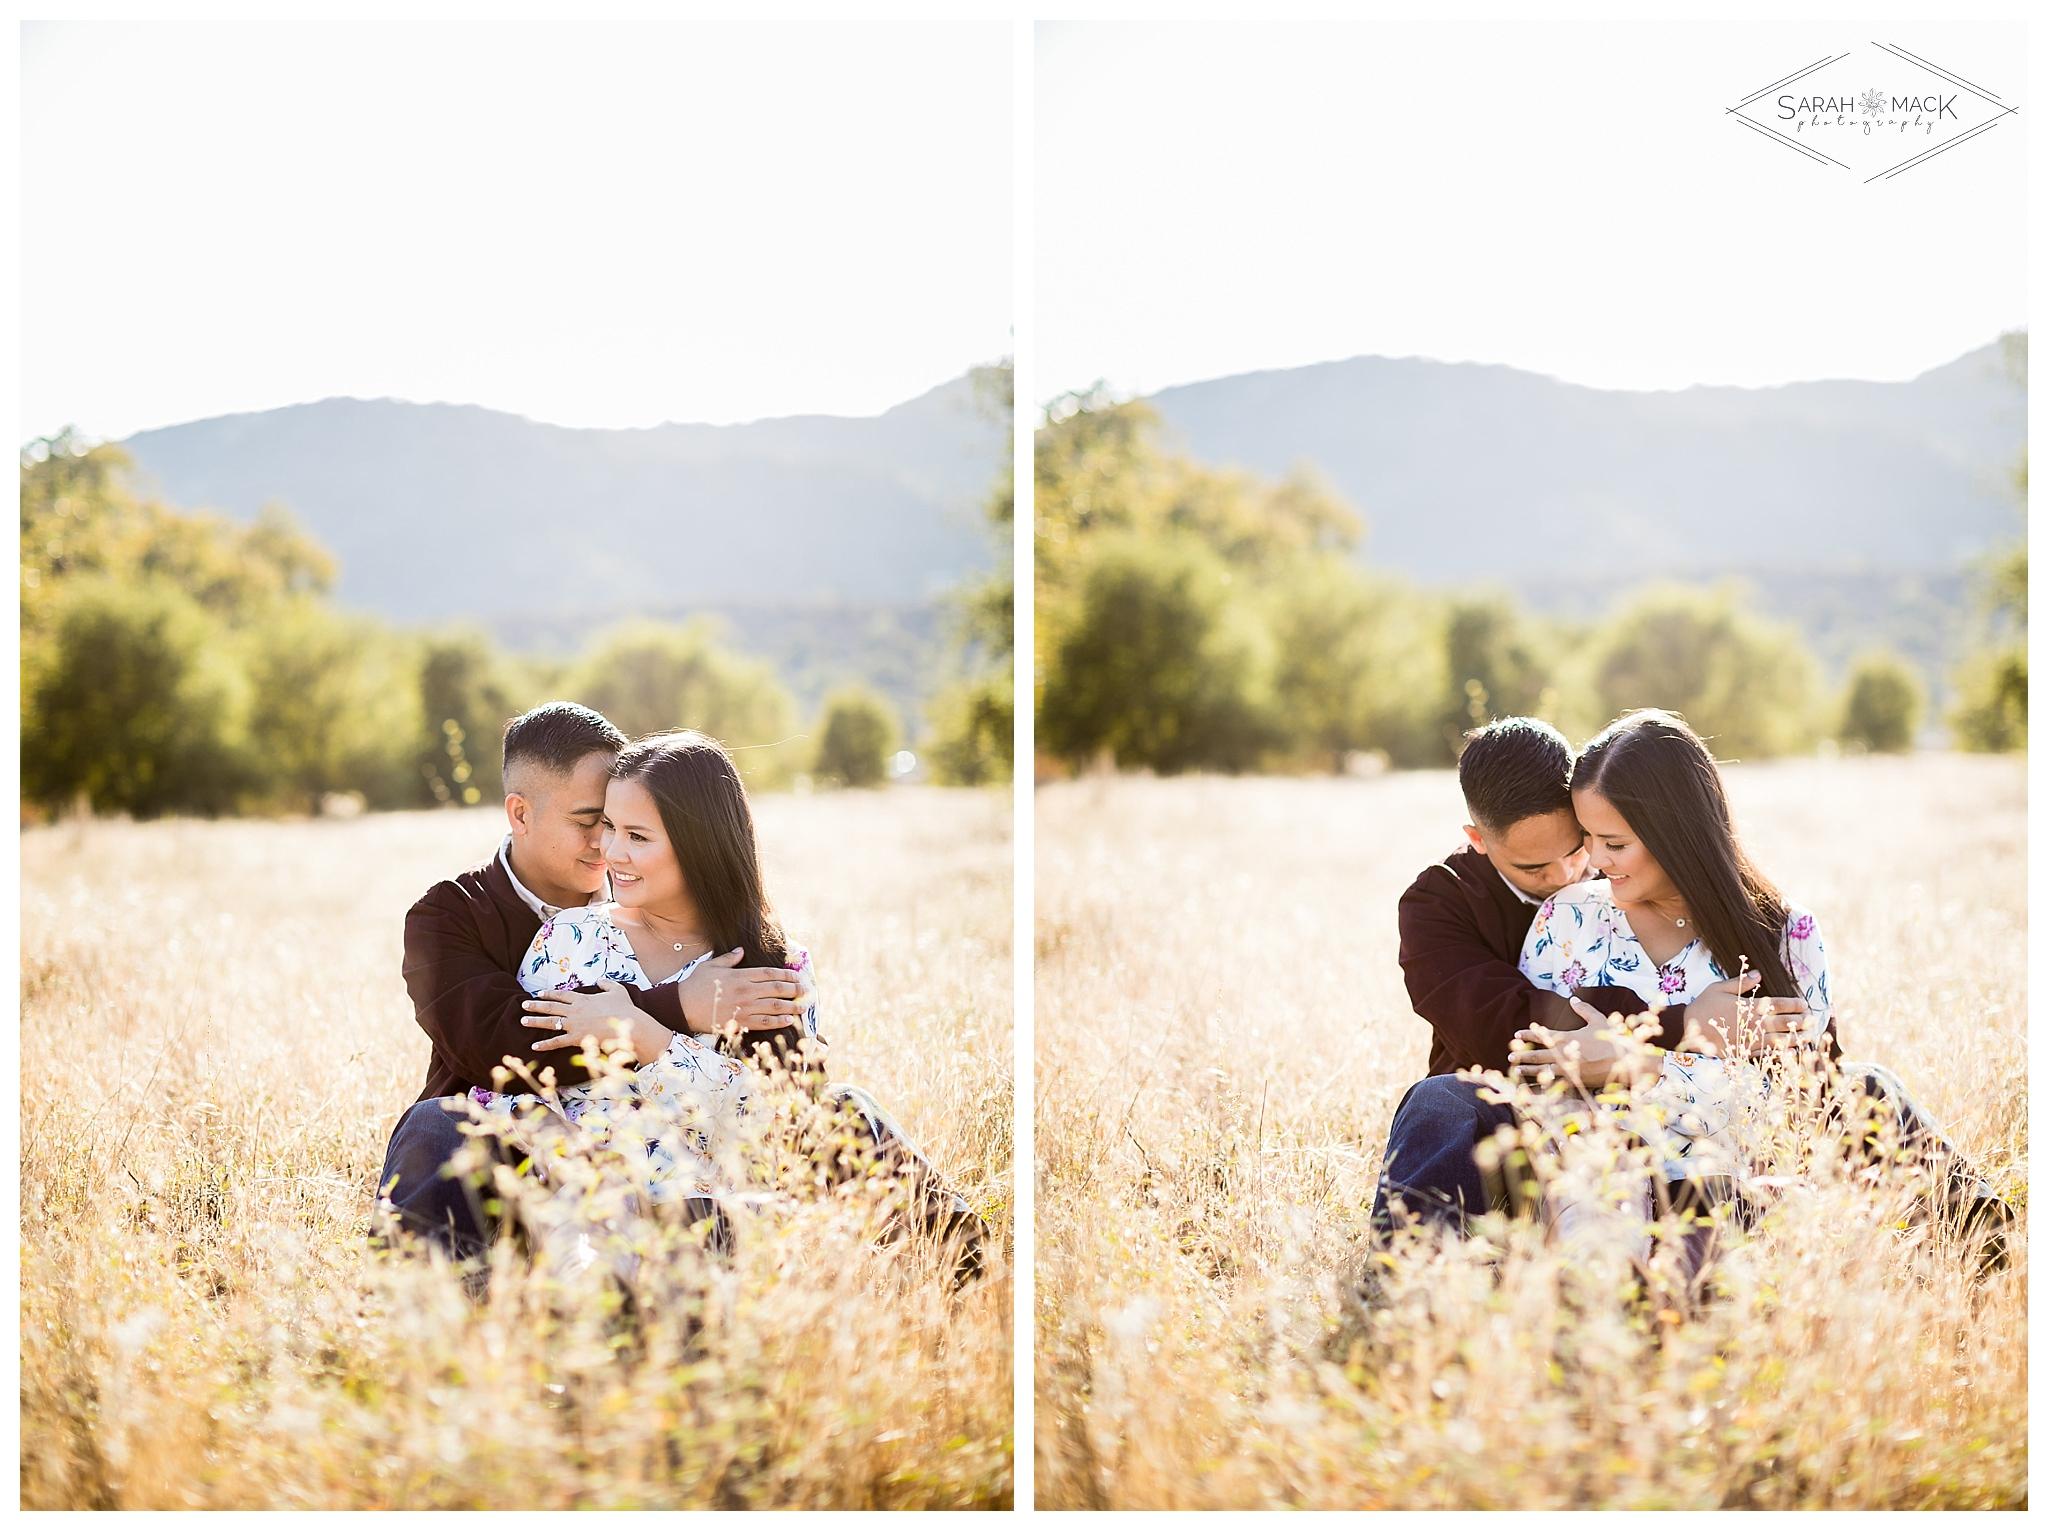 LE_Orange-County-Engagement-Photography 46.jpg